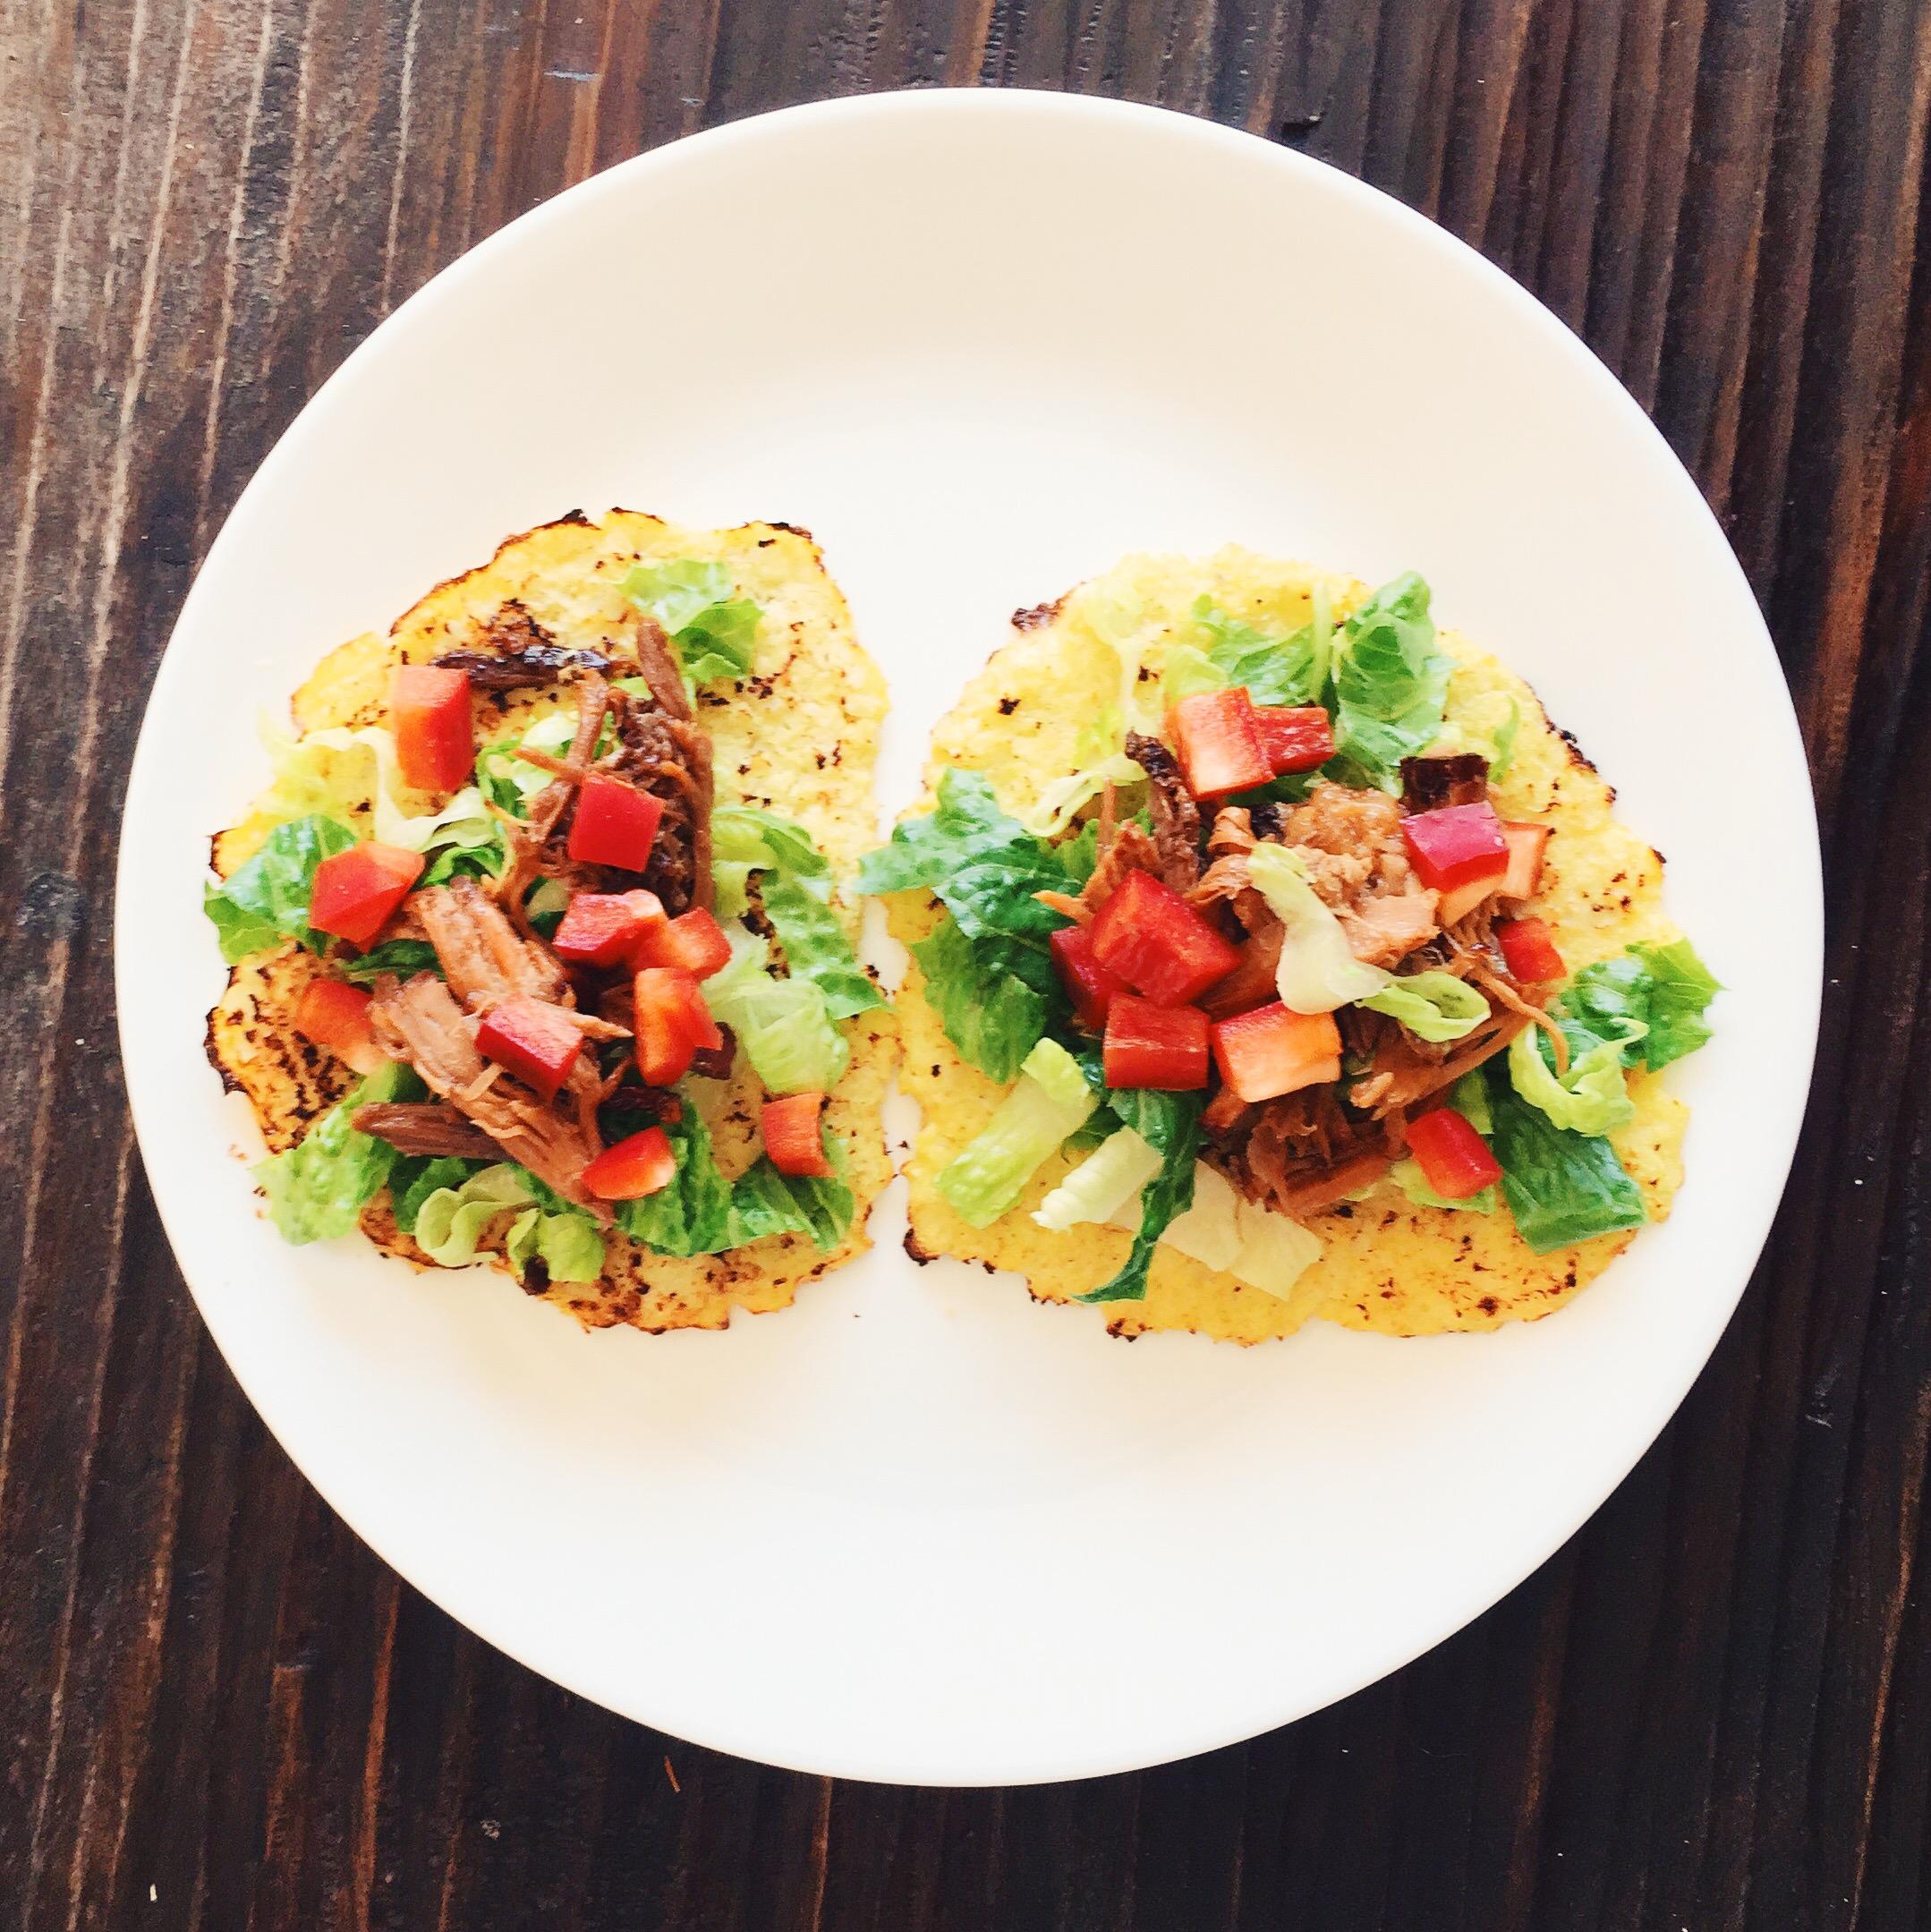 Cauliflower tortillas with pulled pork and veggies